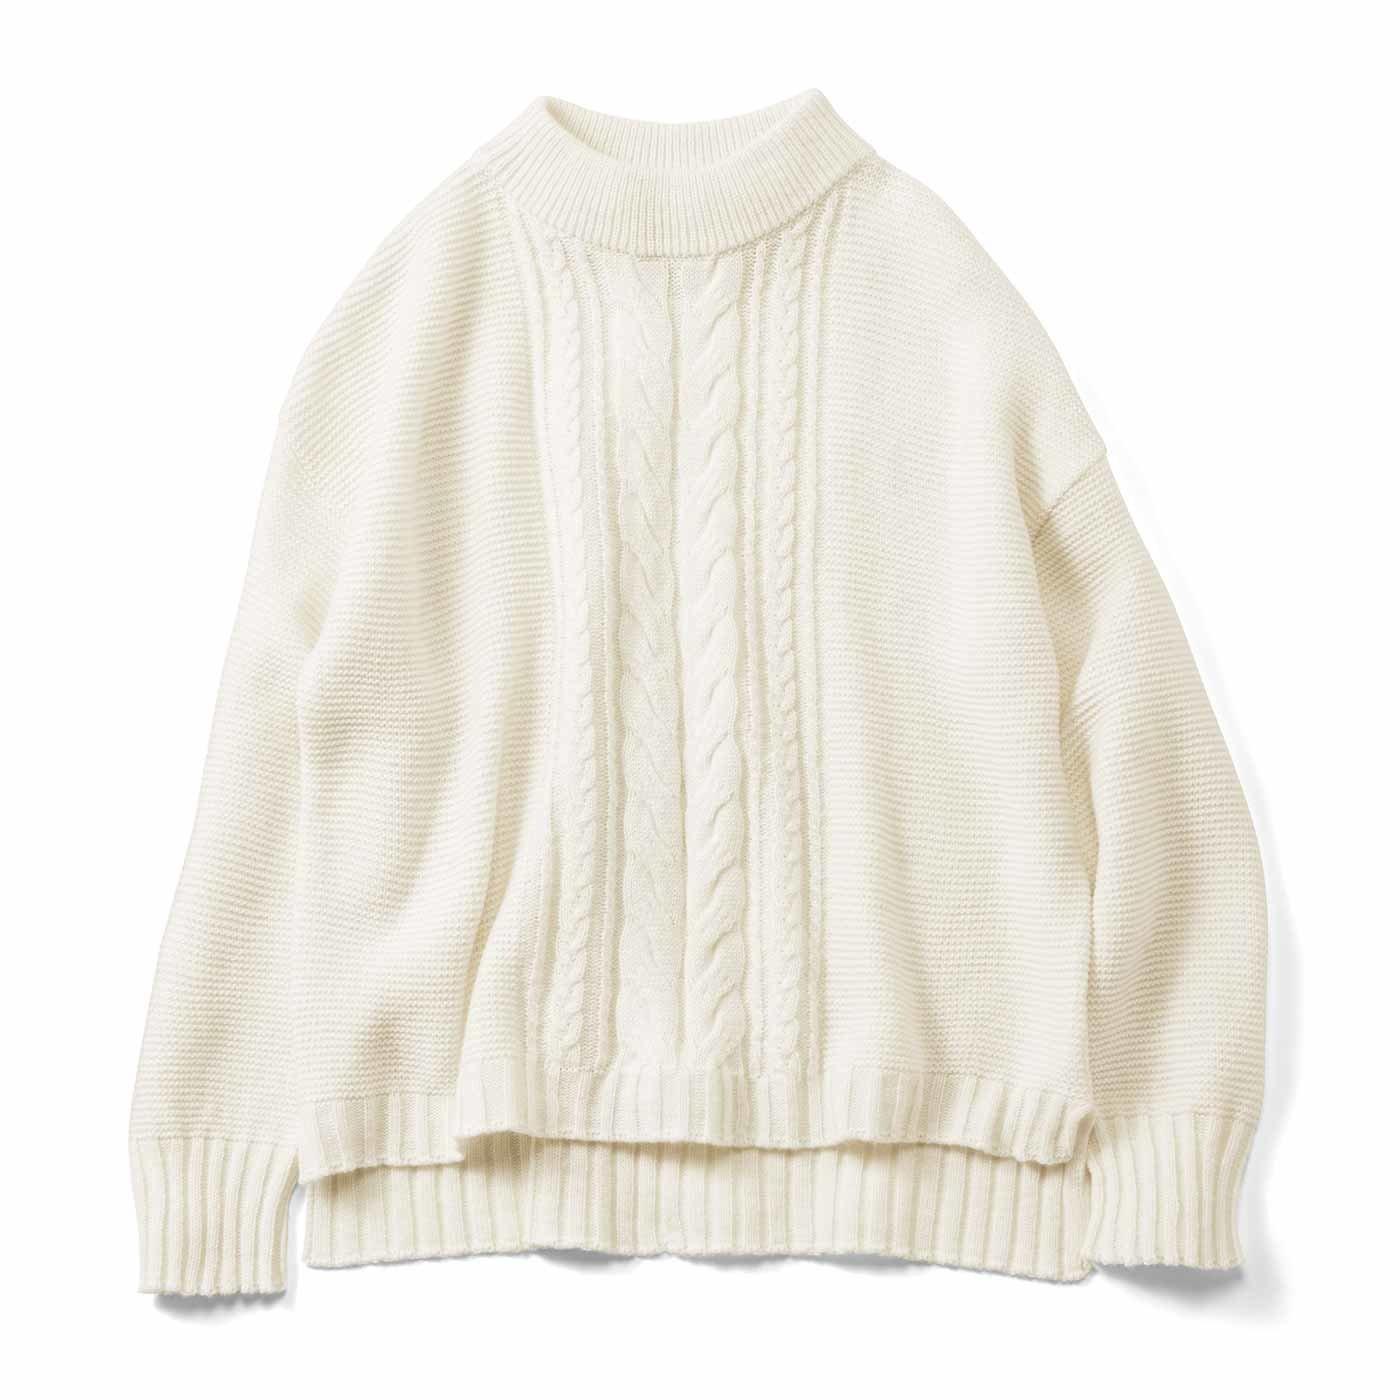 HIROMI YOSHIDA. アラン模様で切り替えた真っ白なセーター